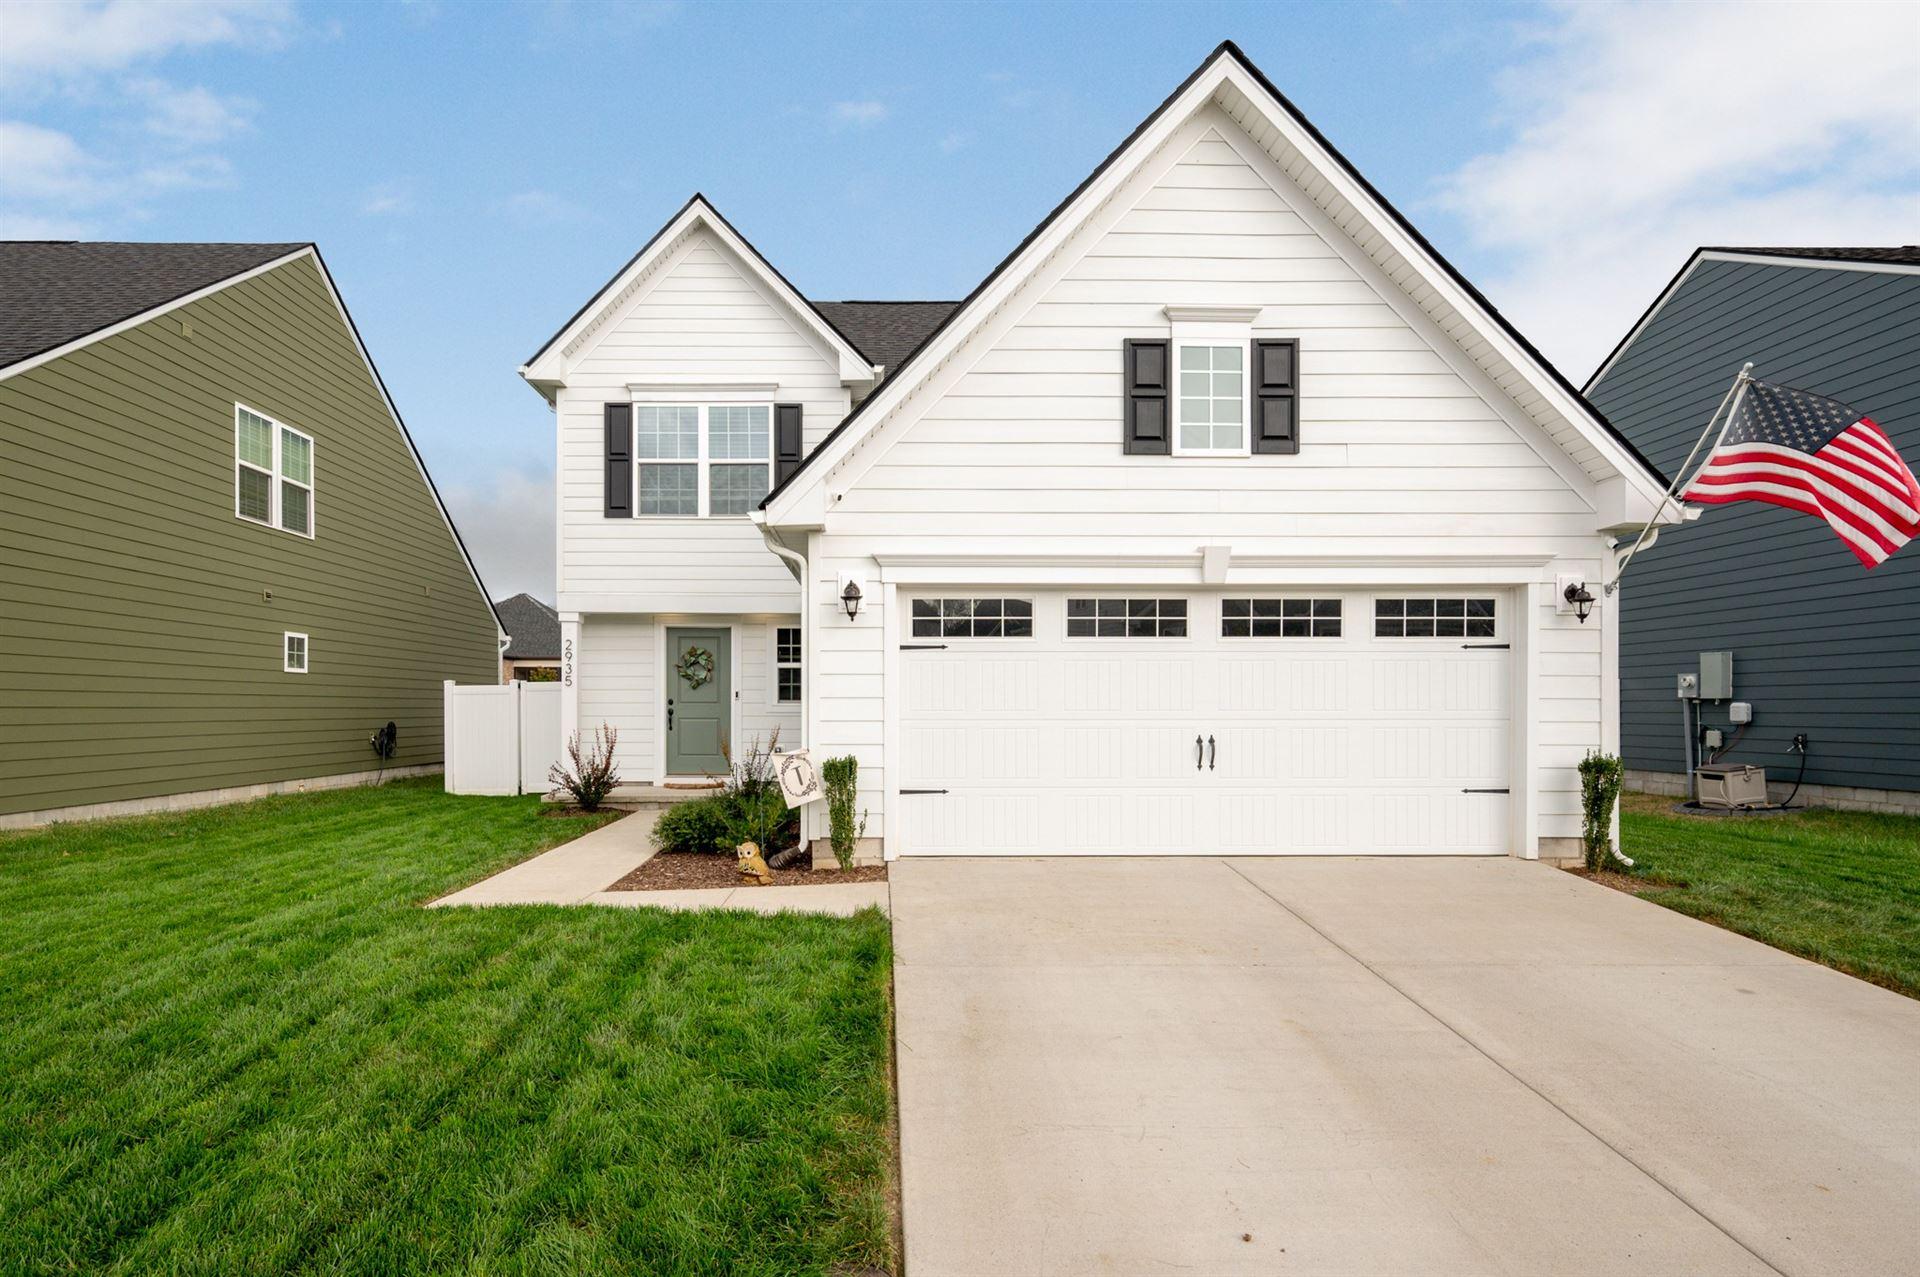 2935 Bluestem Ln, Murfreesboro, TN 37128 - MLS#: 2292674